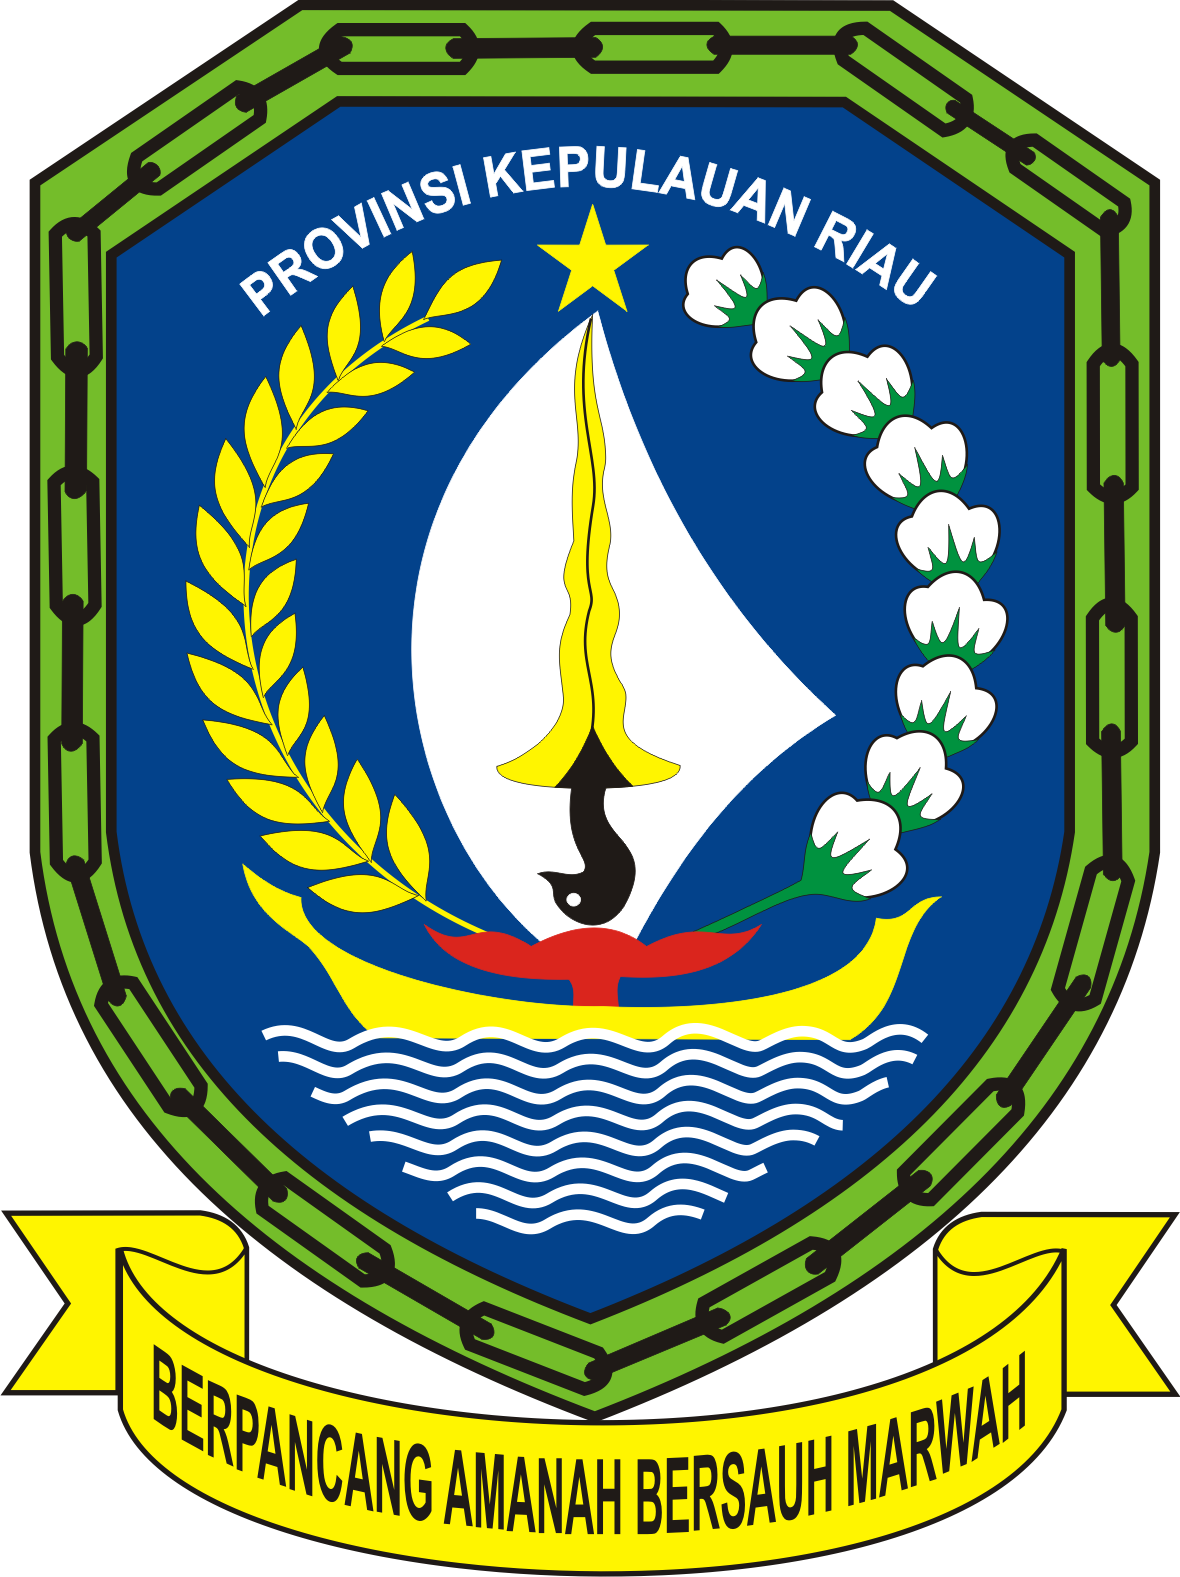 logo provinsi kepulauan riau kumpulan logo indonesia